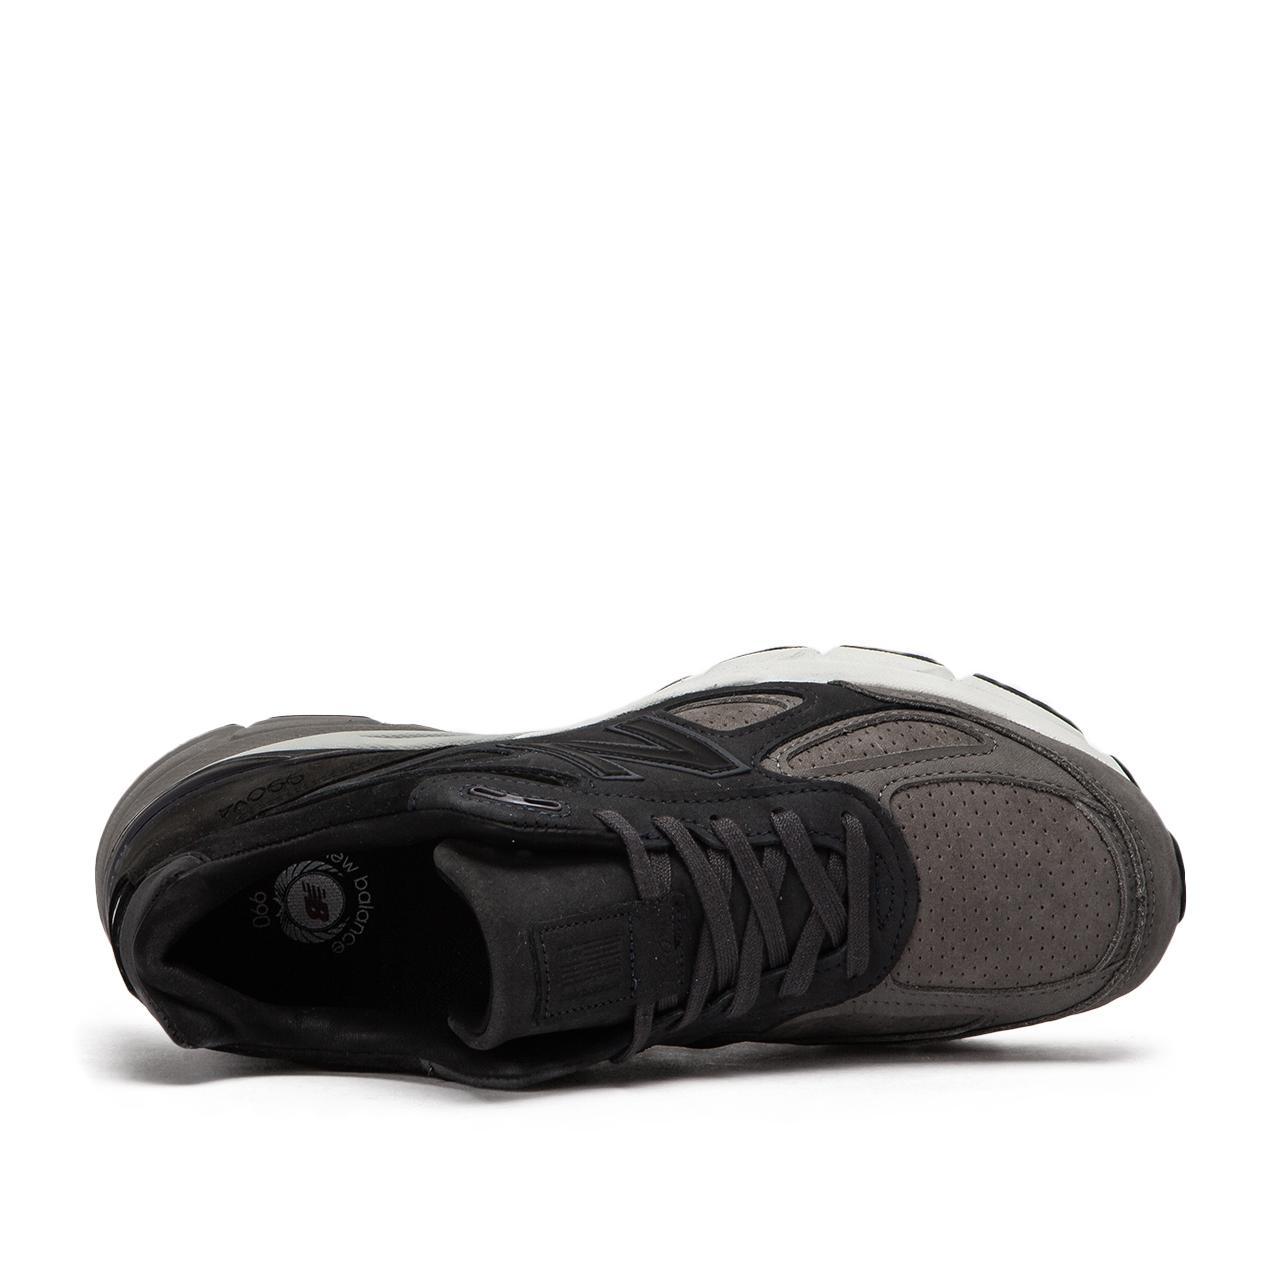 New Balance Leather M 990 Feg4 \